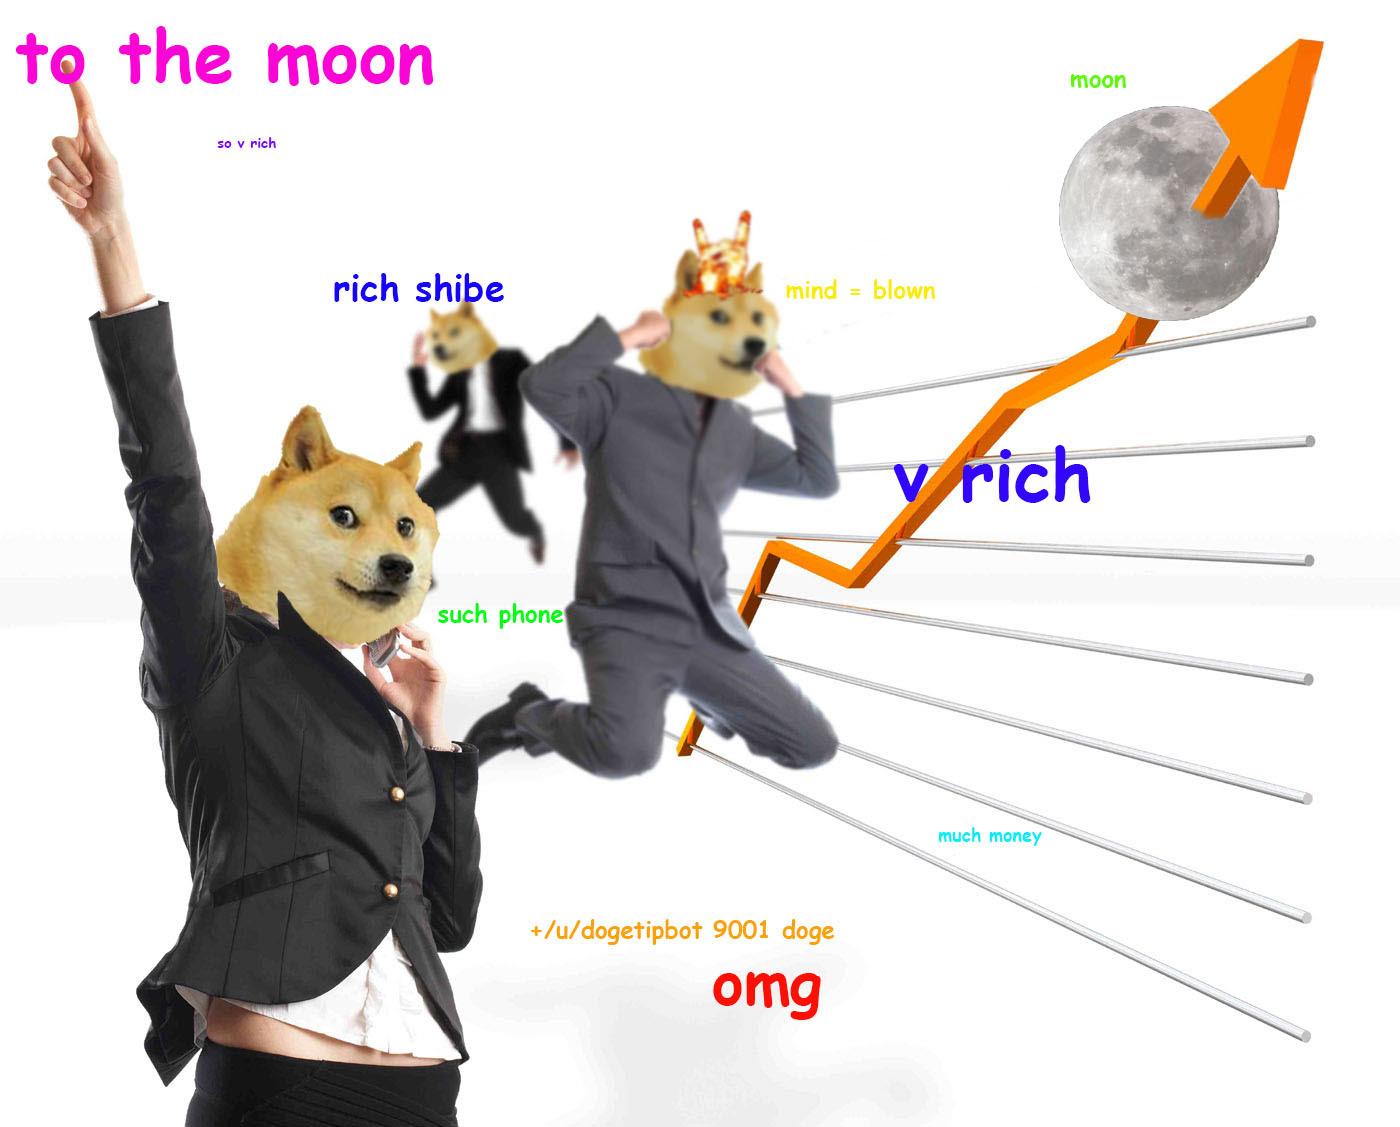 Cara Mendapatkan Dogecoin Klaim Tanpa Batas